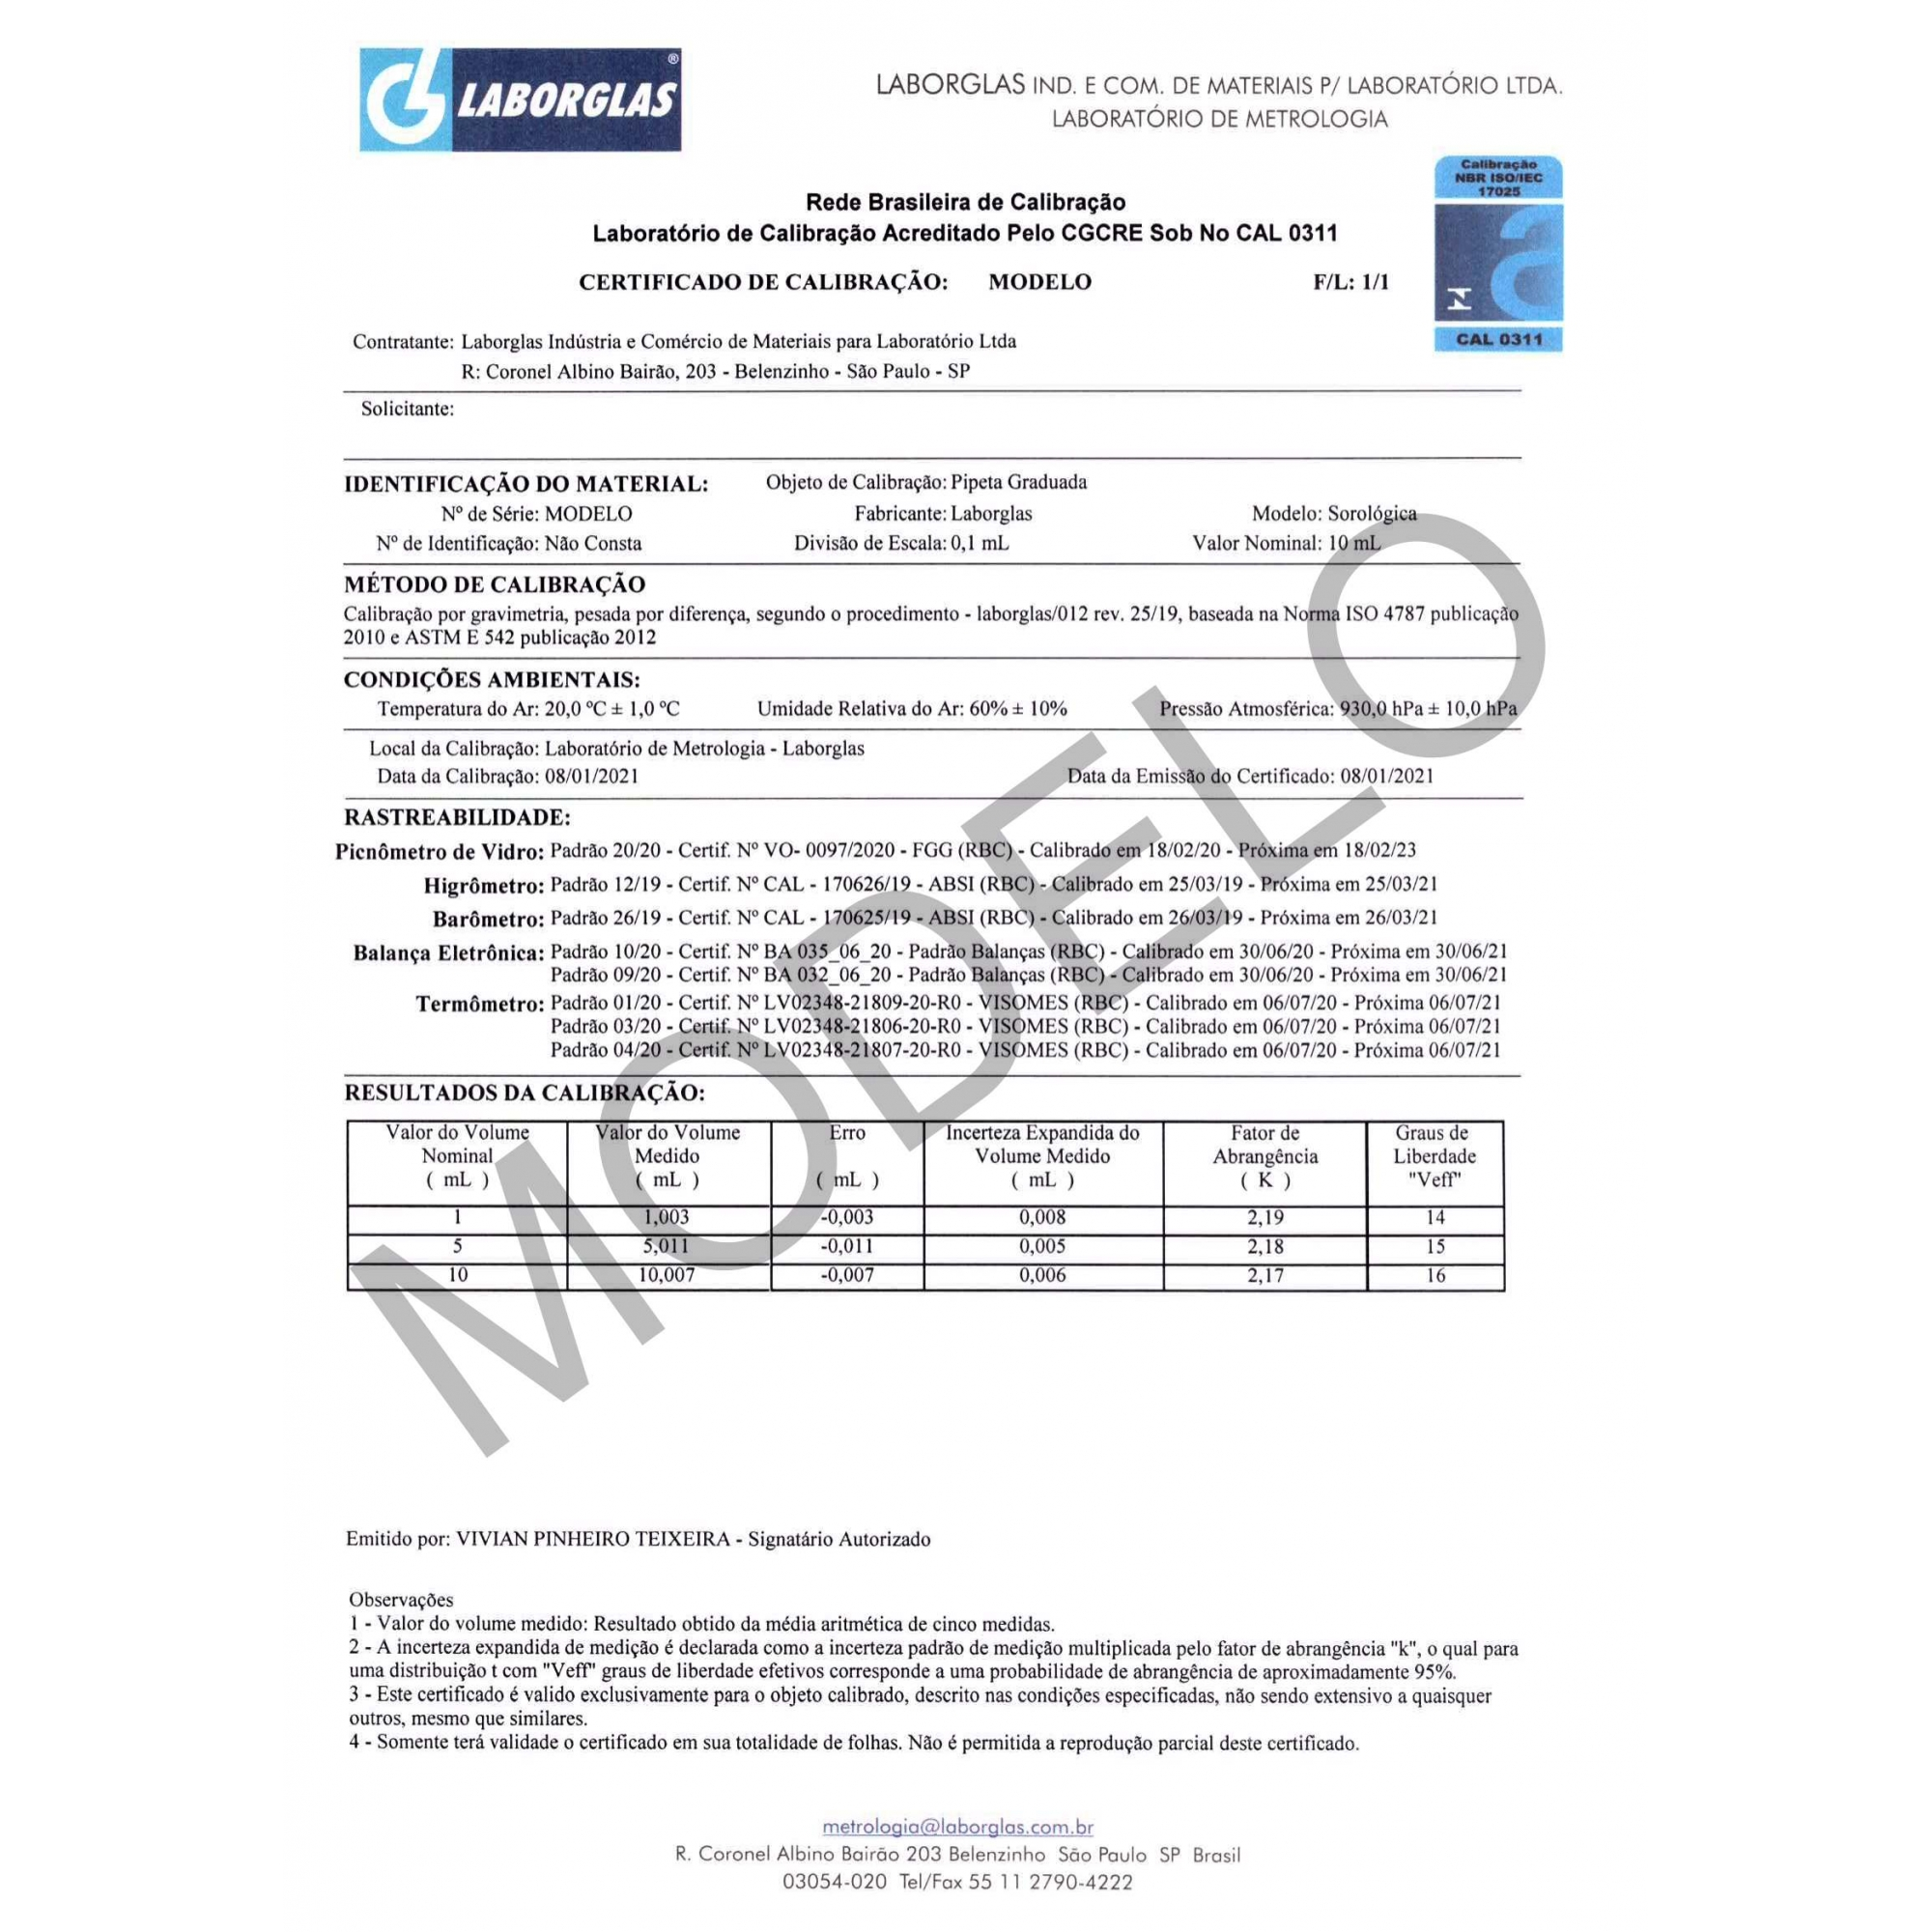 PIPETA GRAD. SOROL. ESGOT. TOTAL 0,1 ML 1/1000 COM CERTIFICADO RBC - Laborglas - Cód. 9434302-R